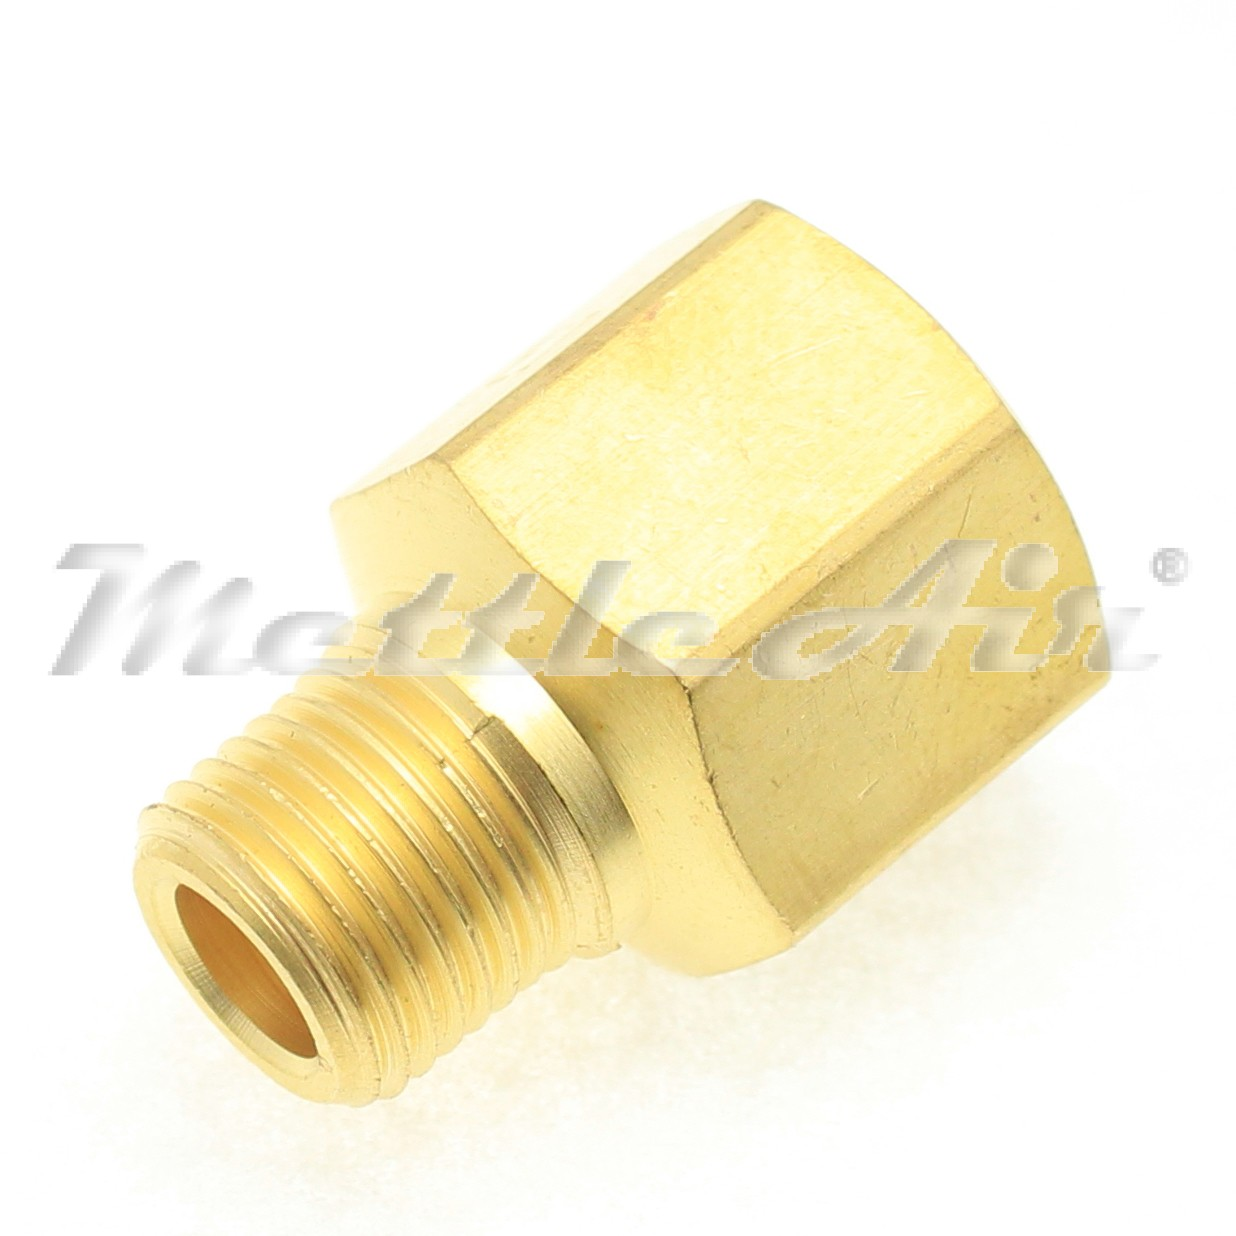 98533712972 Brass Pipe Adaptor 1 8